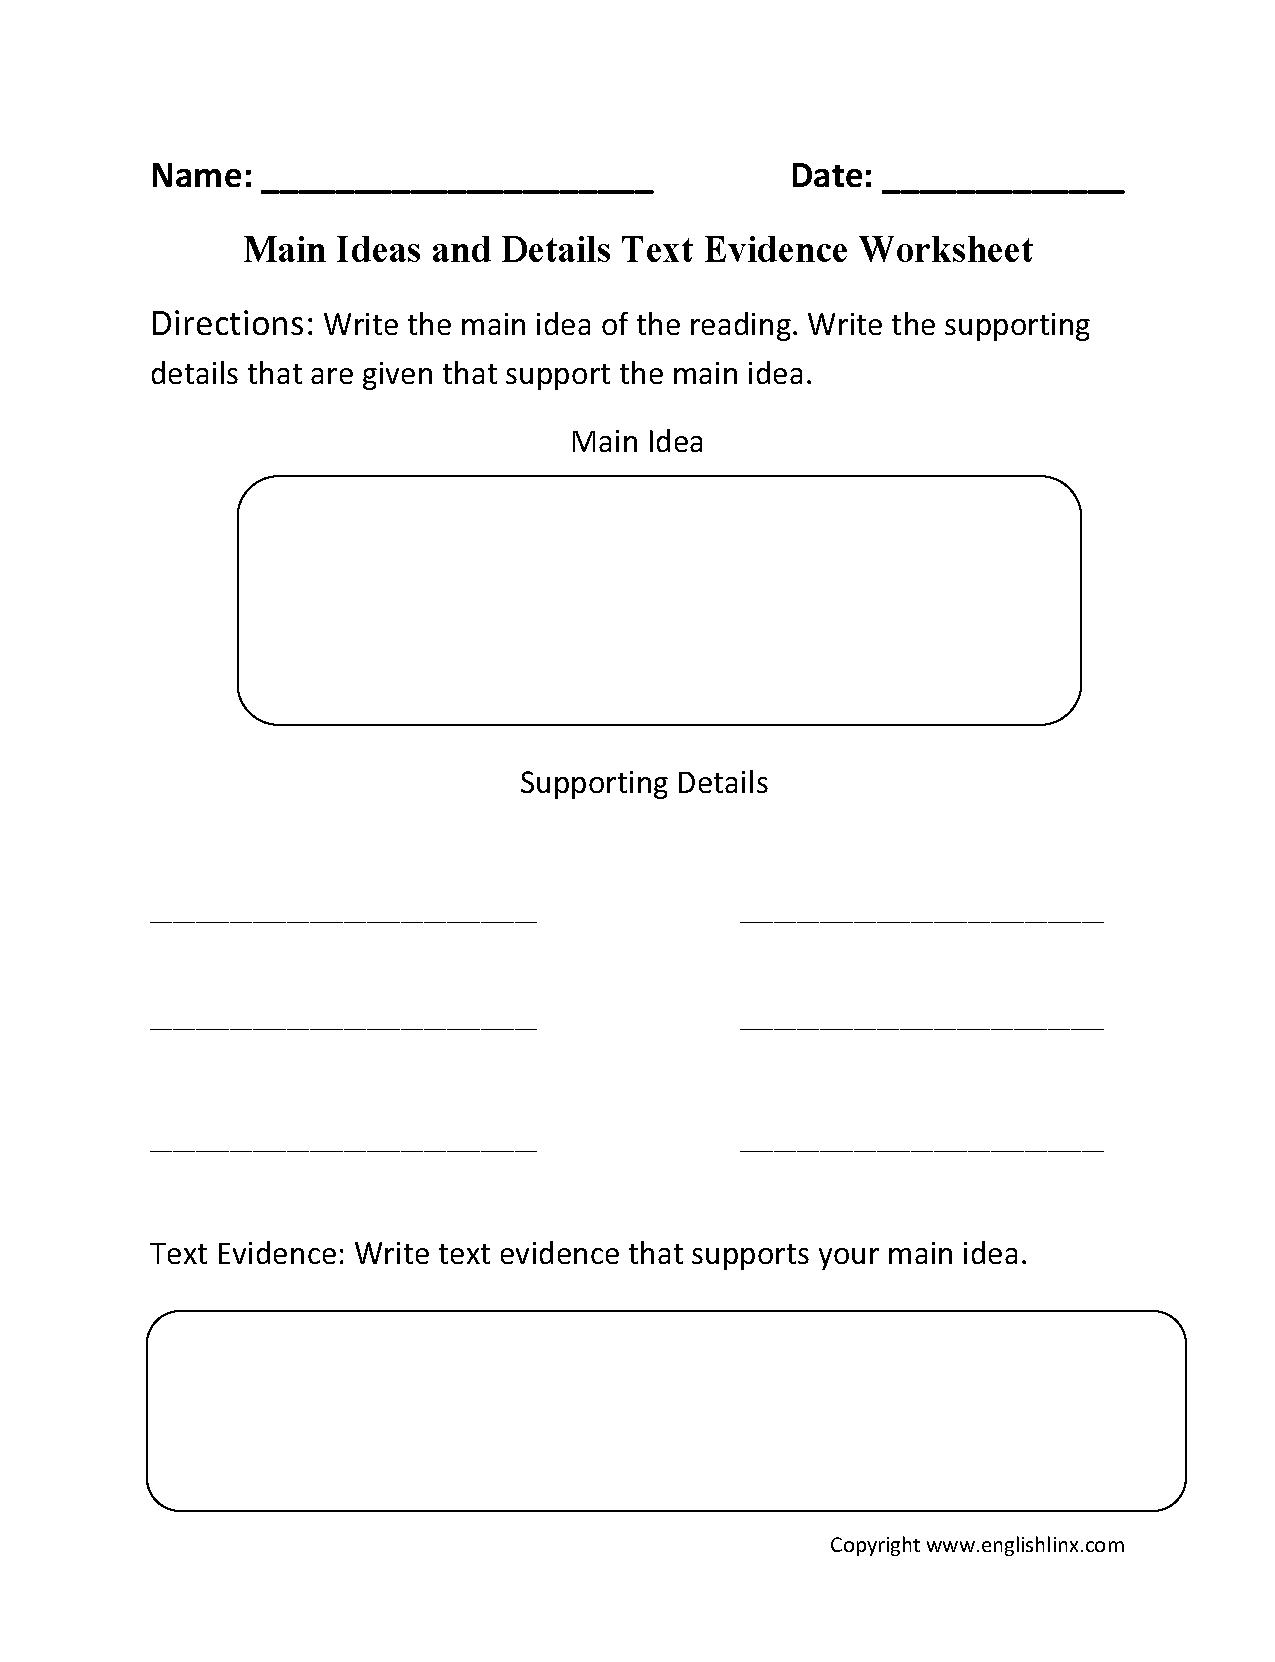 worksheet Main Idea Details Worksheet main idea worksheets eng writing pinterest worksheets